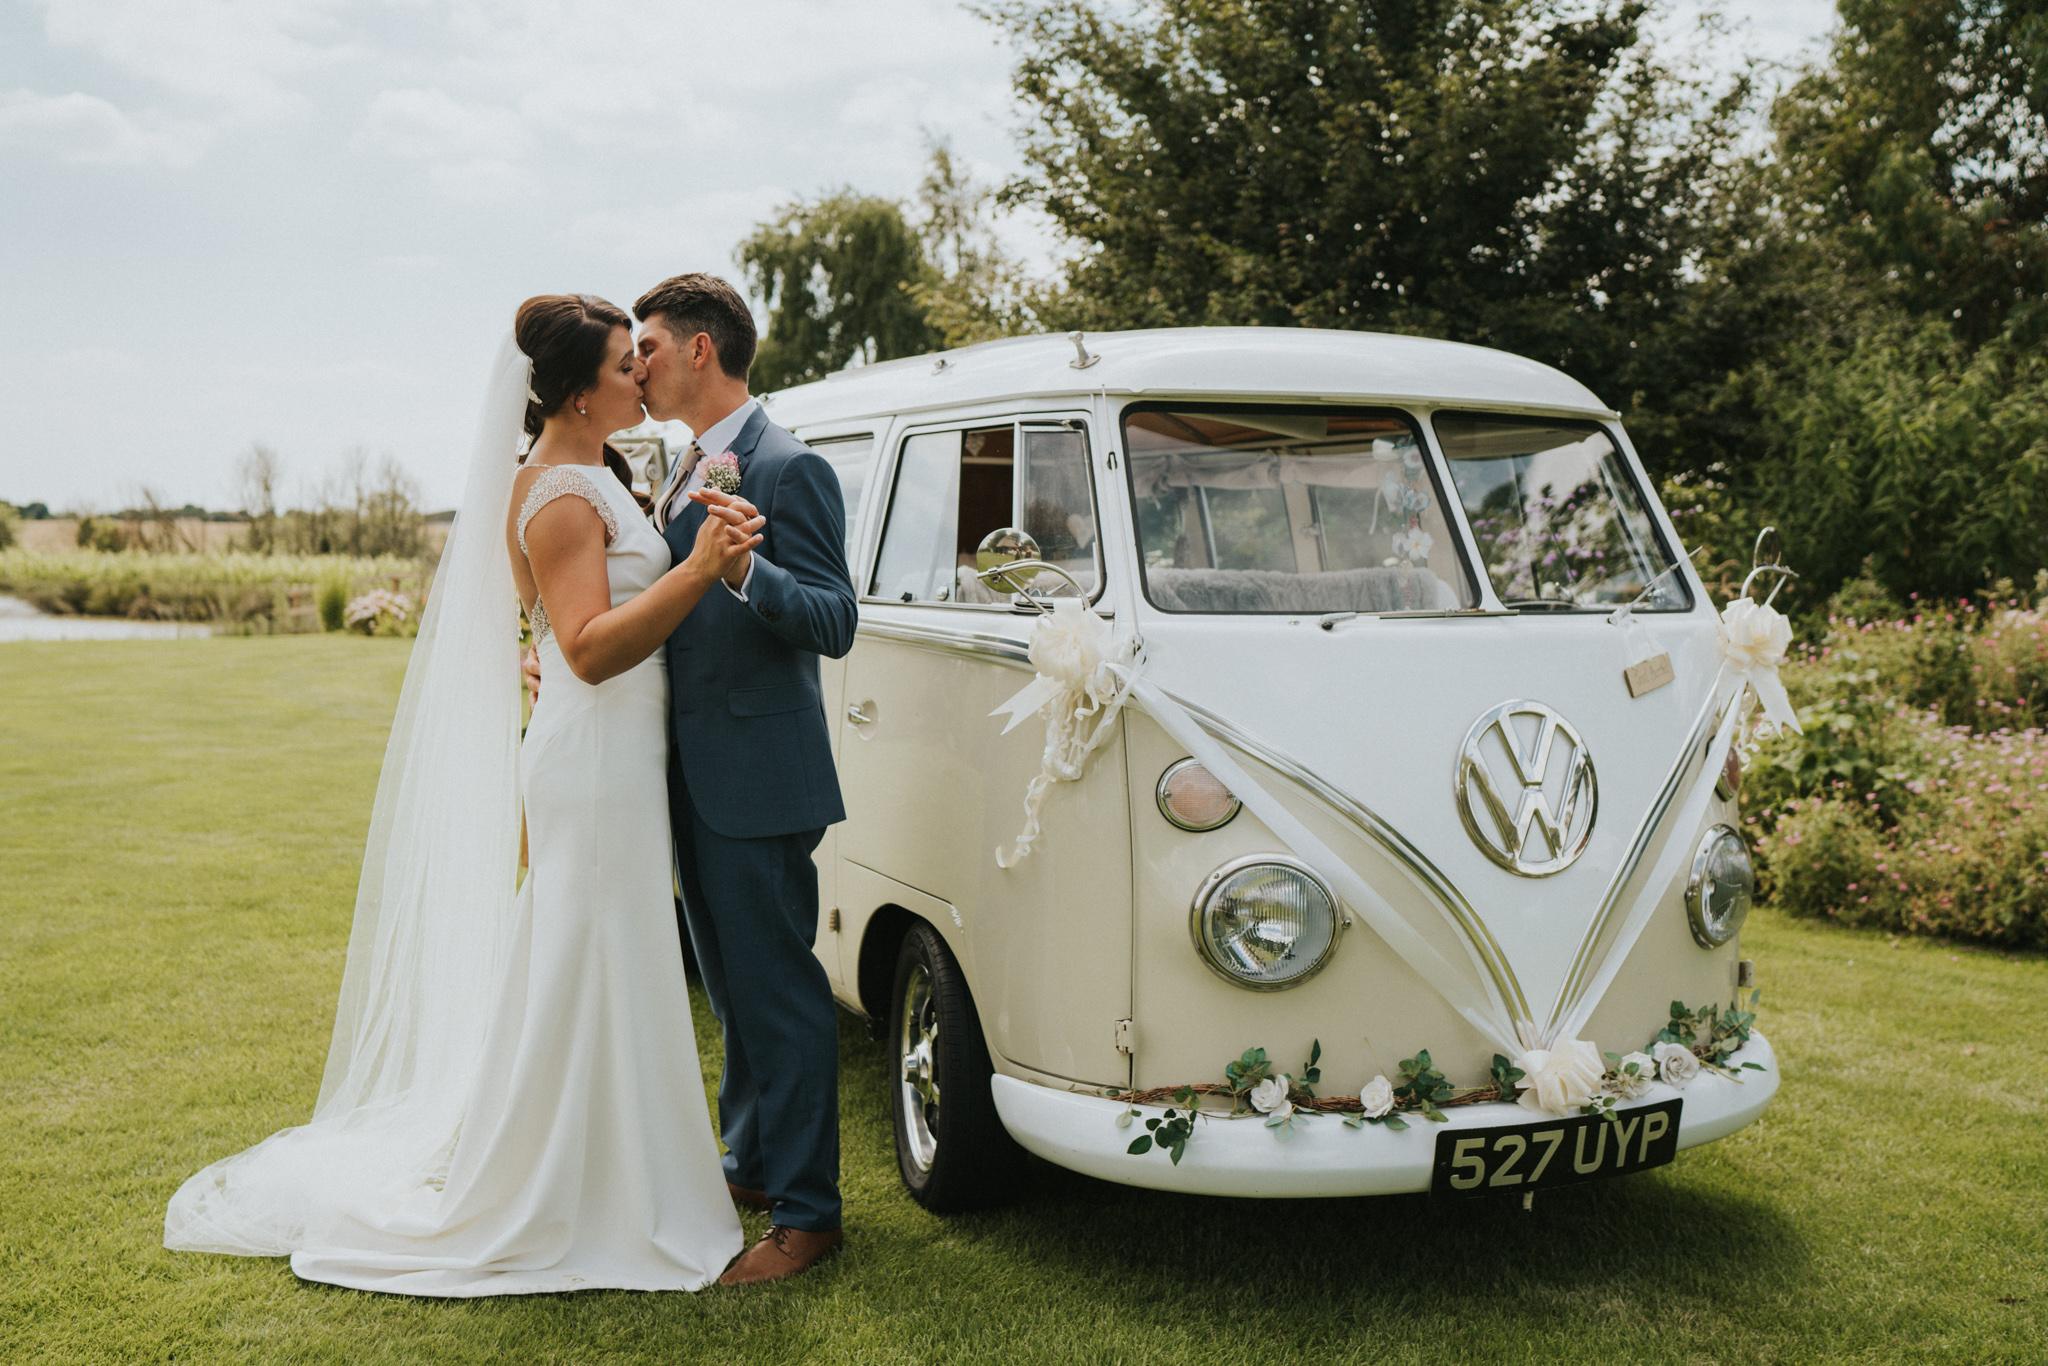 danielle-and-gareths-boho-wedding-previews-at-high-house-weddings-grace-elizabeth-colchester-essex-suffolk-norfolk-devon-alternative-wedding-and-lifestyle-photographer (40 of 76).jpg